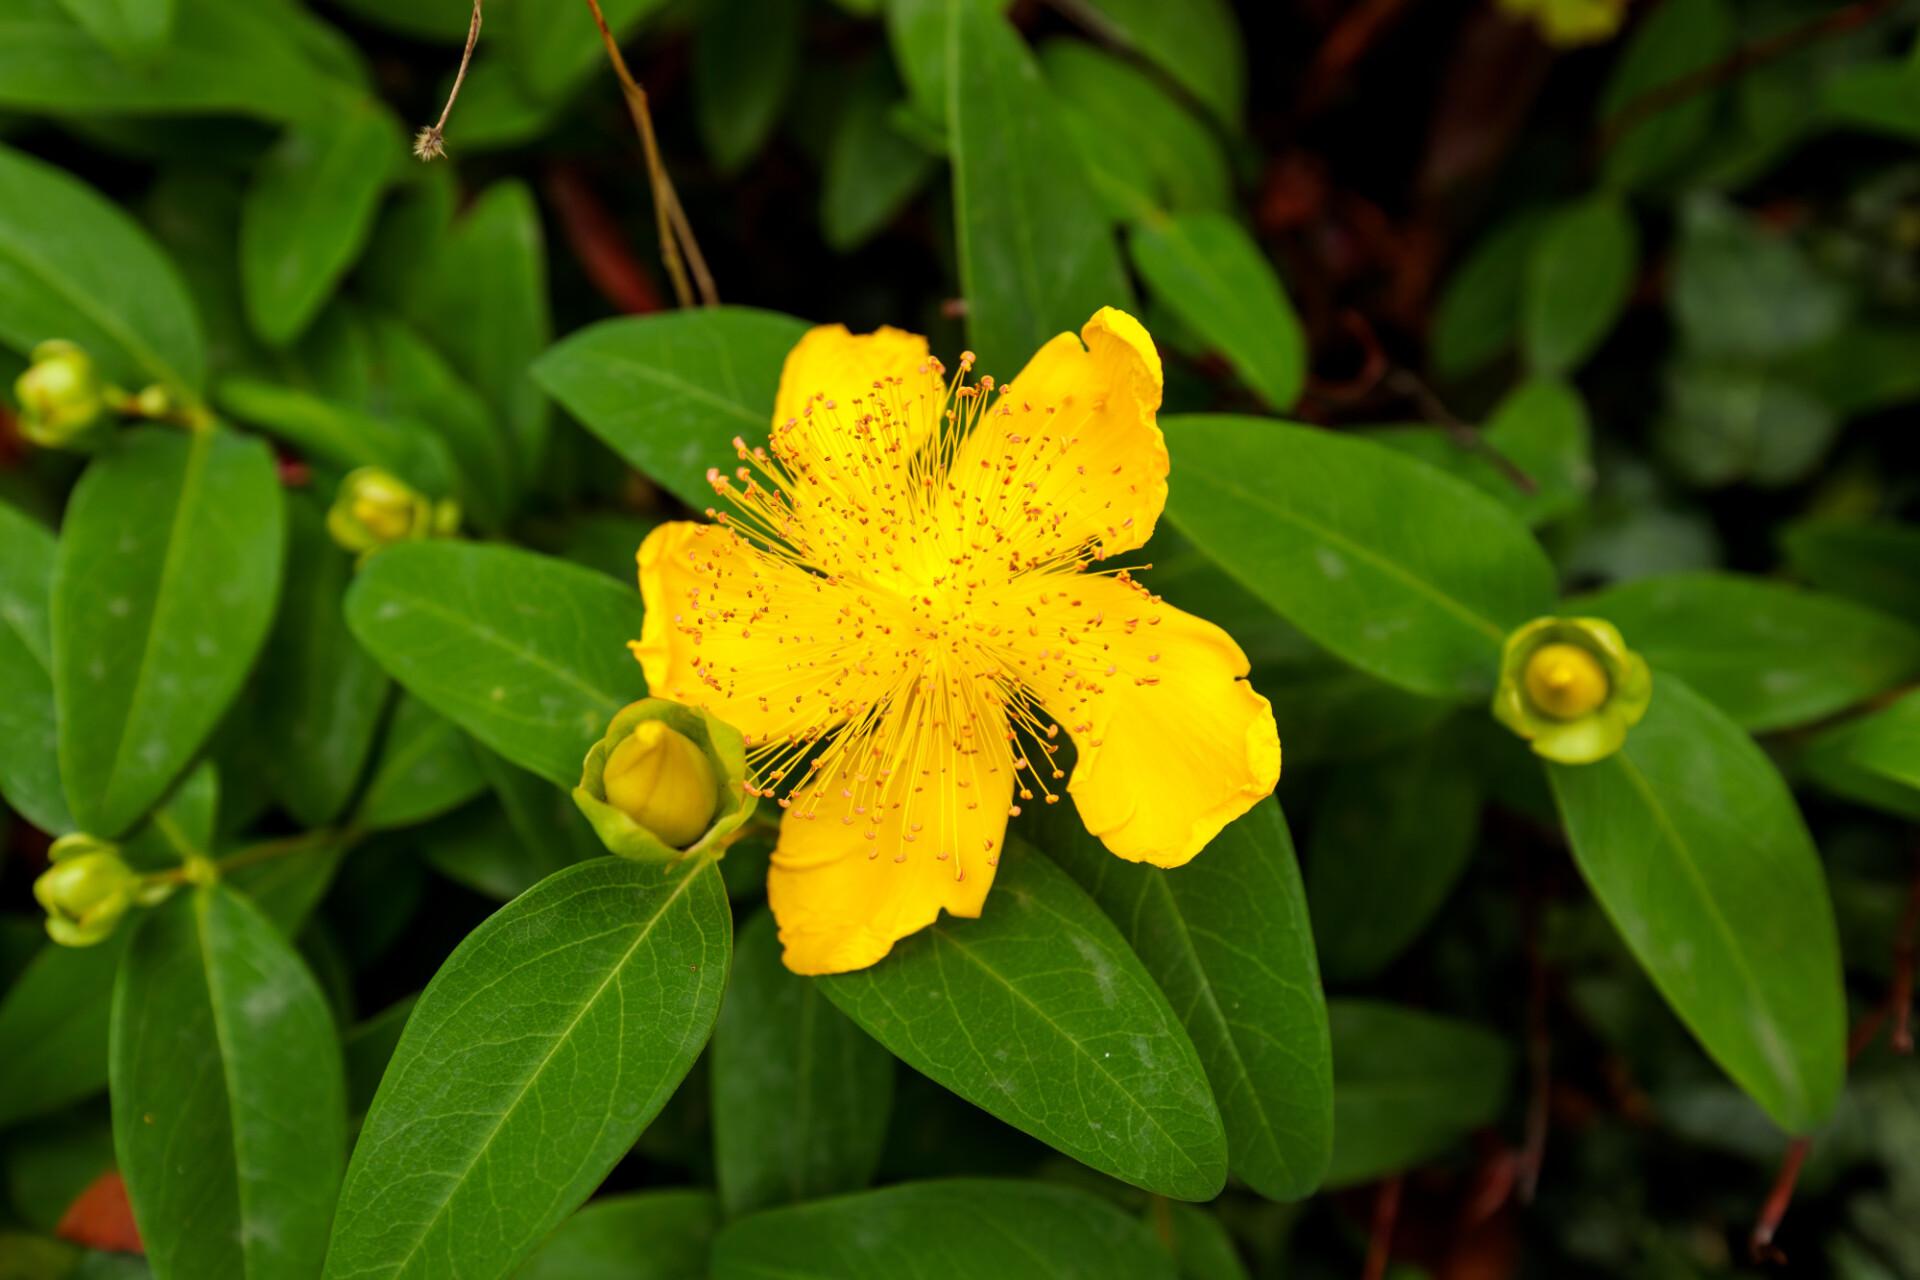 St John's-wort yellow blooming flower